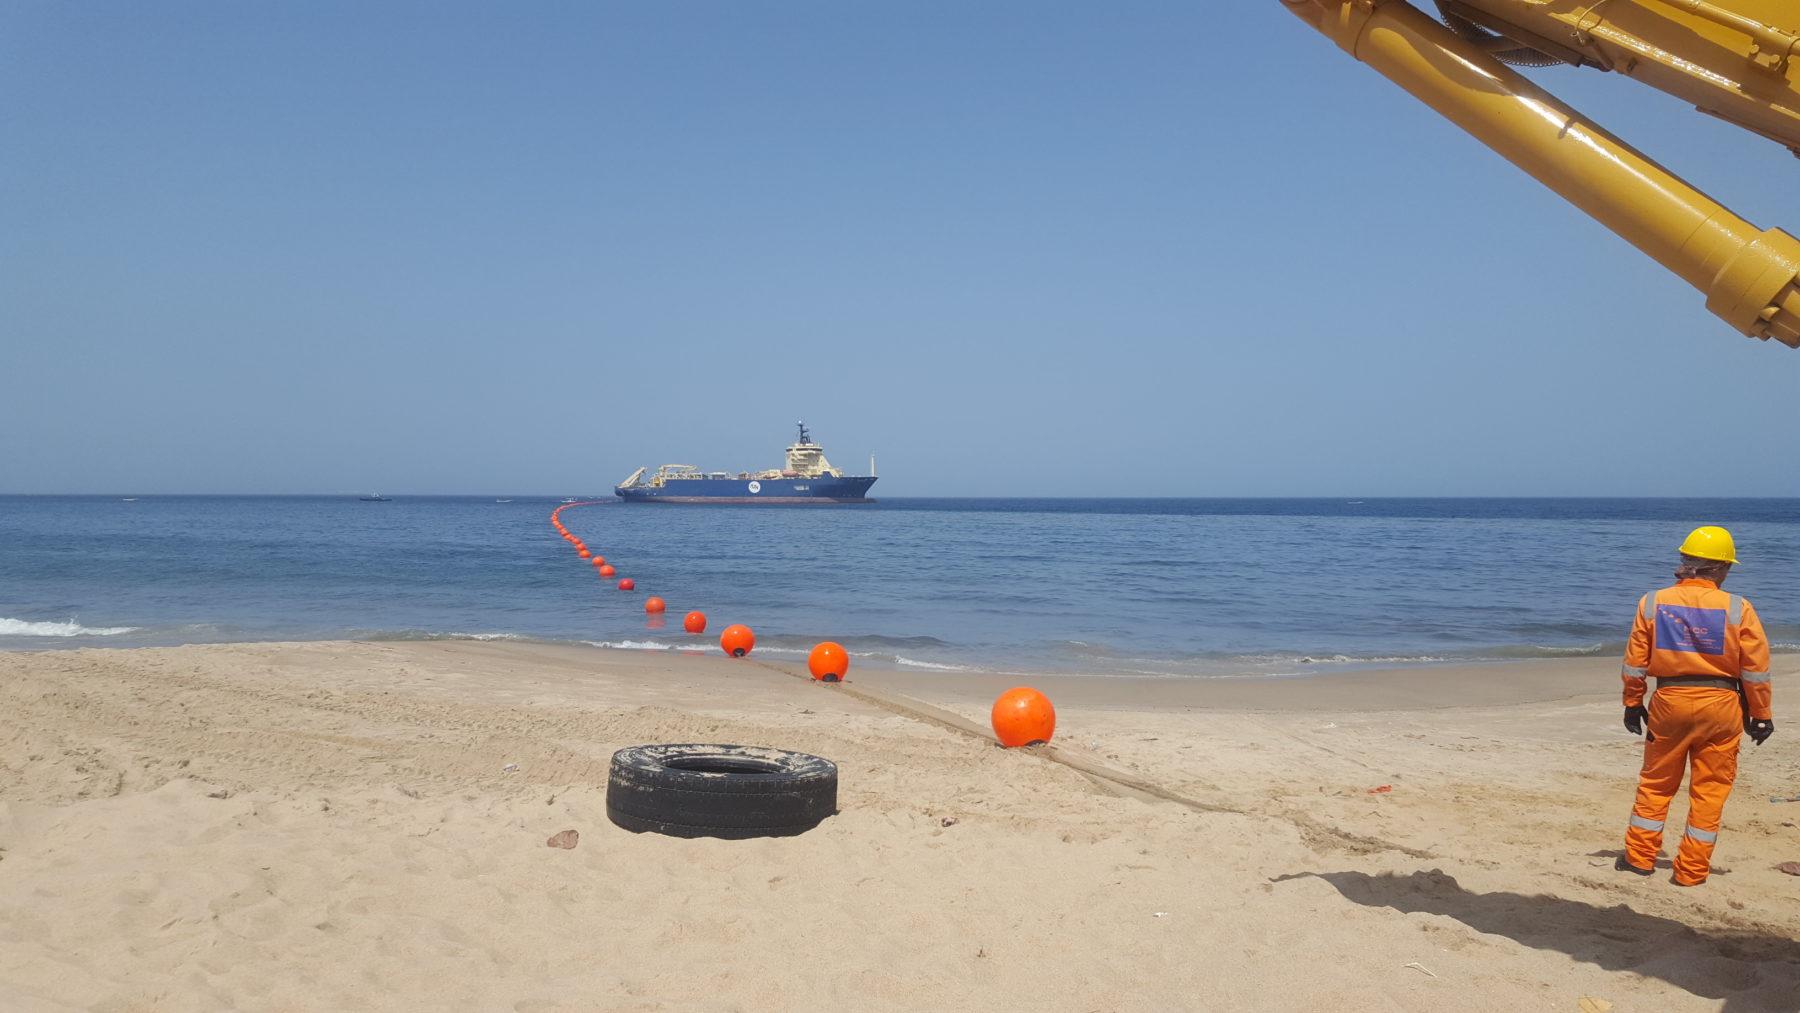 African Coast to Europe (ACE) Seg. 6